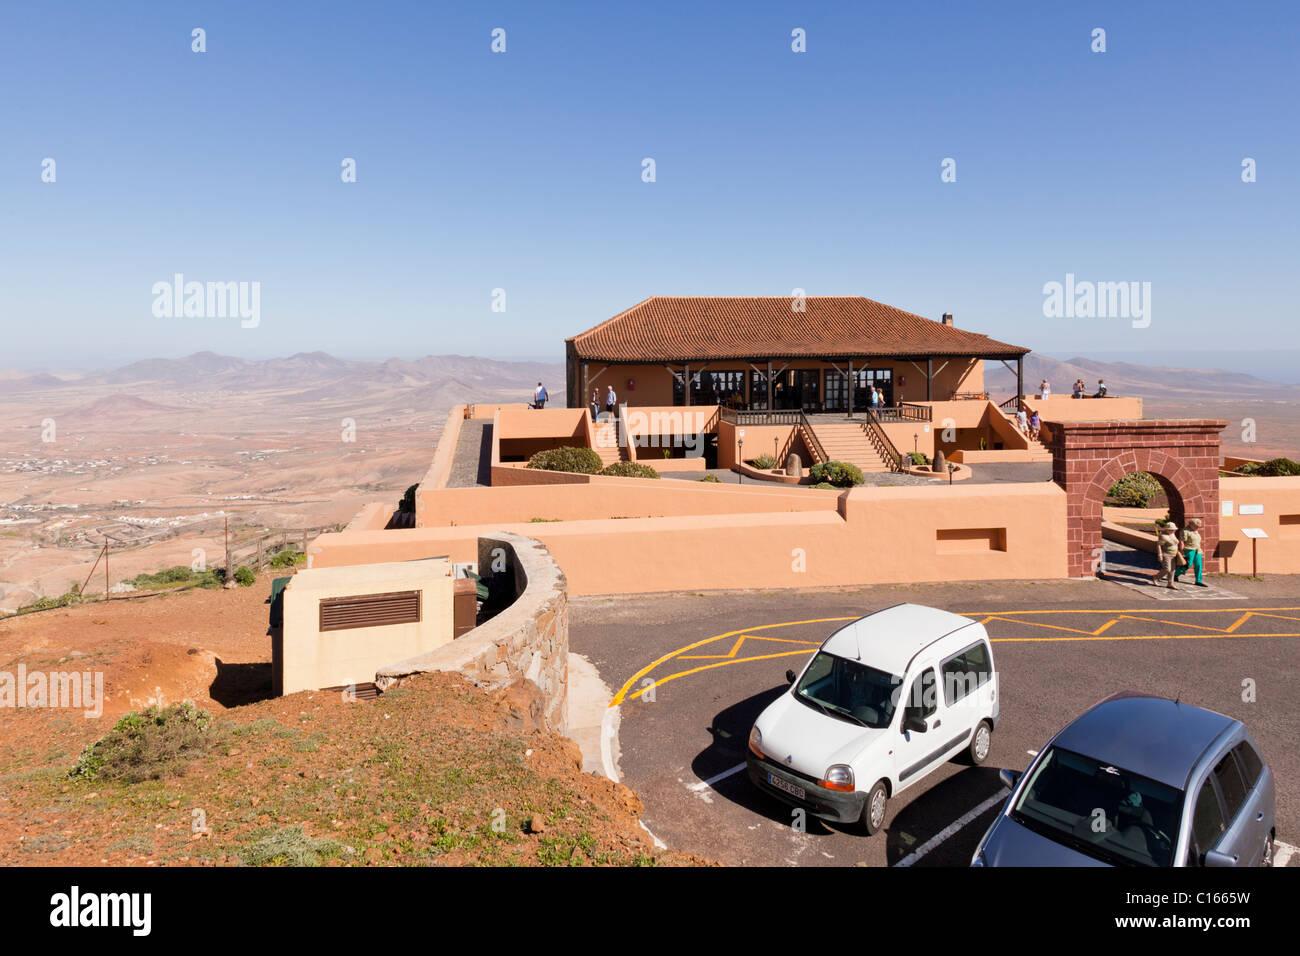 The cafe at Mirador de Morro Velosa, a 650 metre high viewpoint on the Canary Island of Fuerteventura - Stock Image